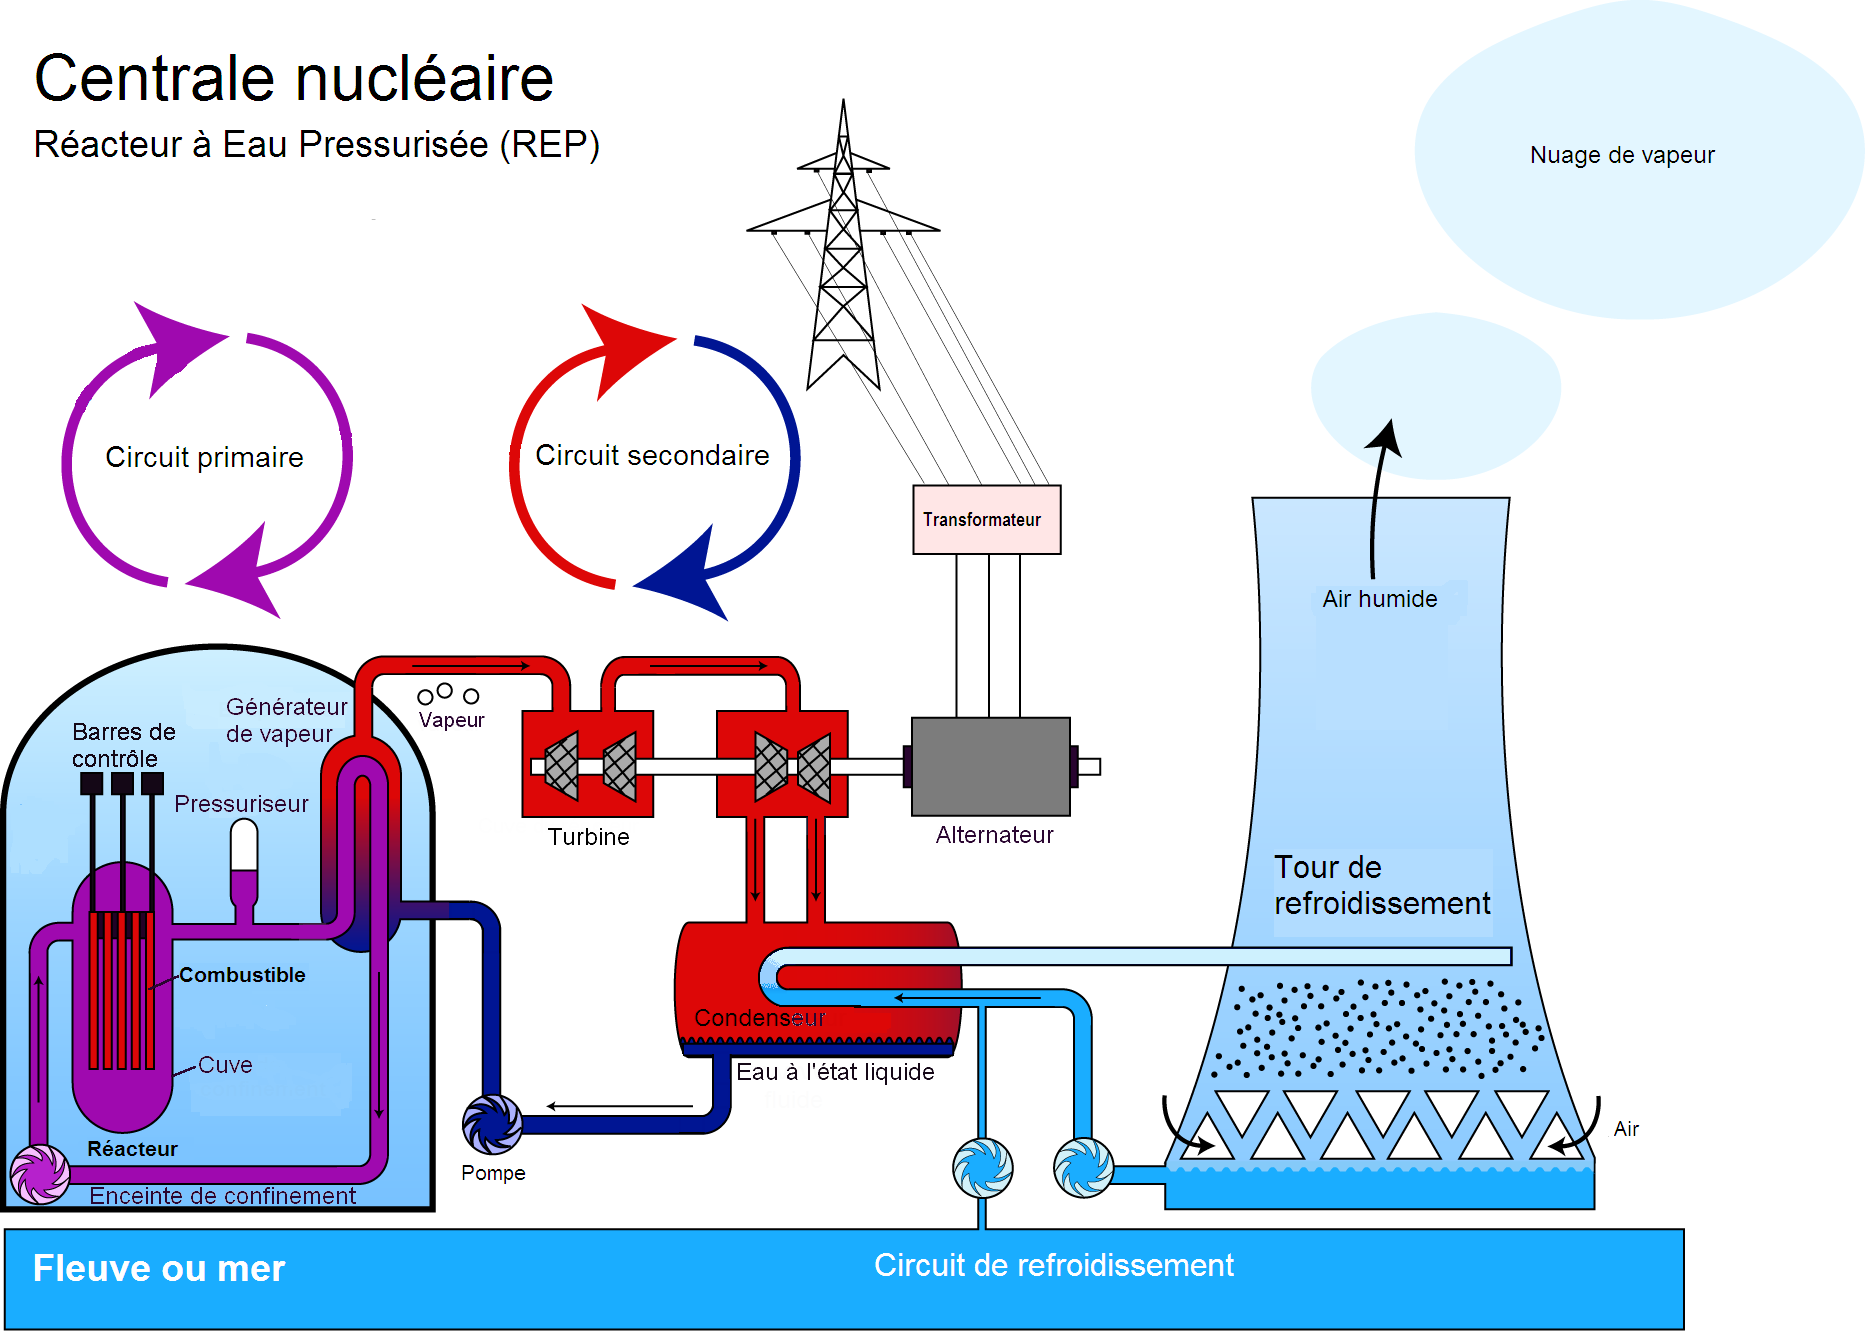 Nom : Centrale_nucléaire_REP.png Affichages : 195 Taille : 186,6 Ko